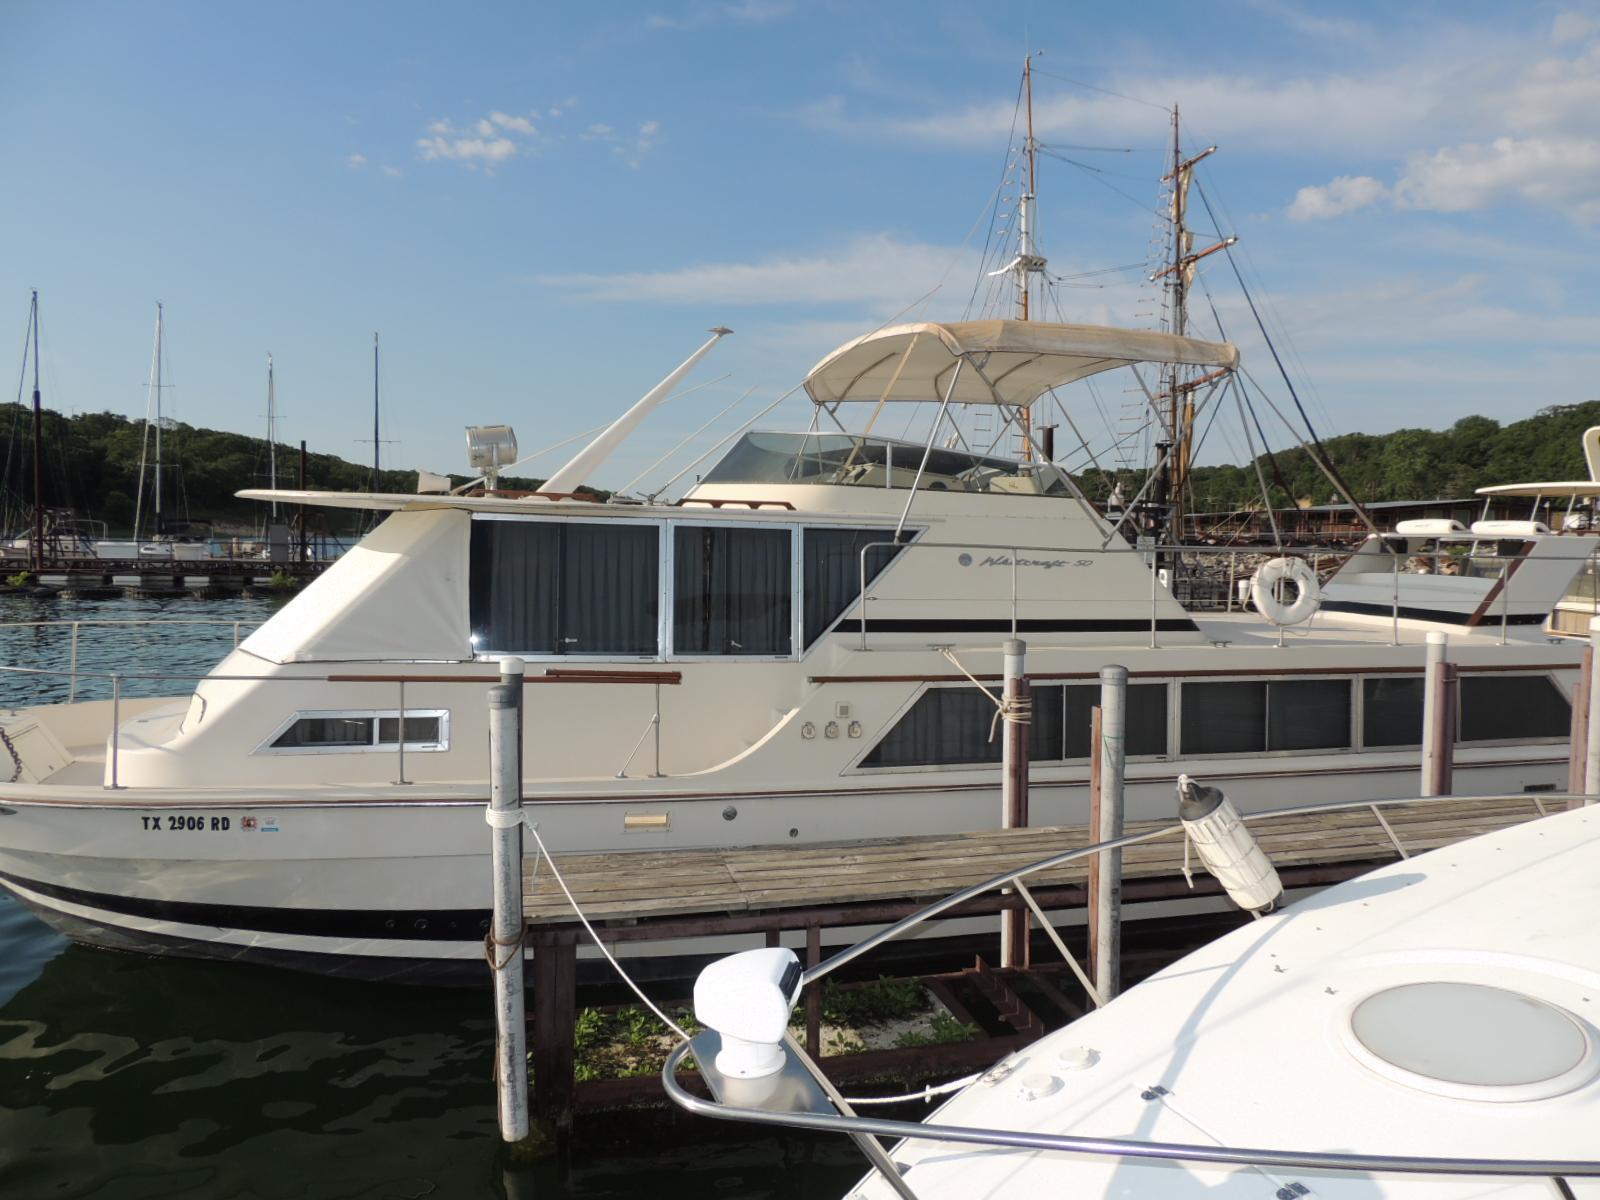 Whitcraft Boat Listings